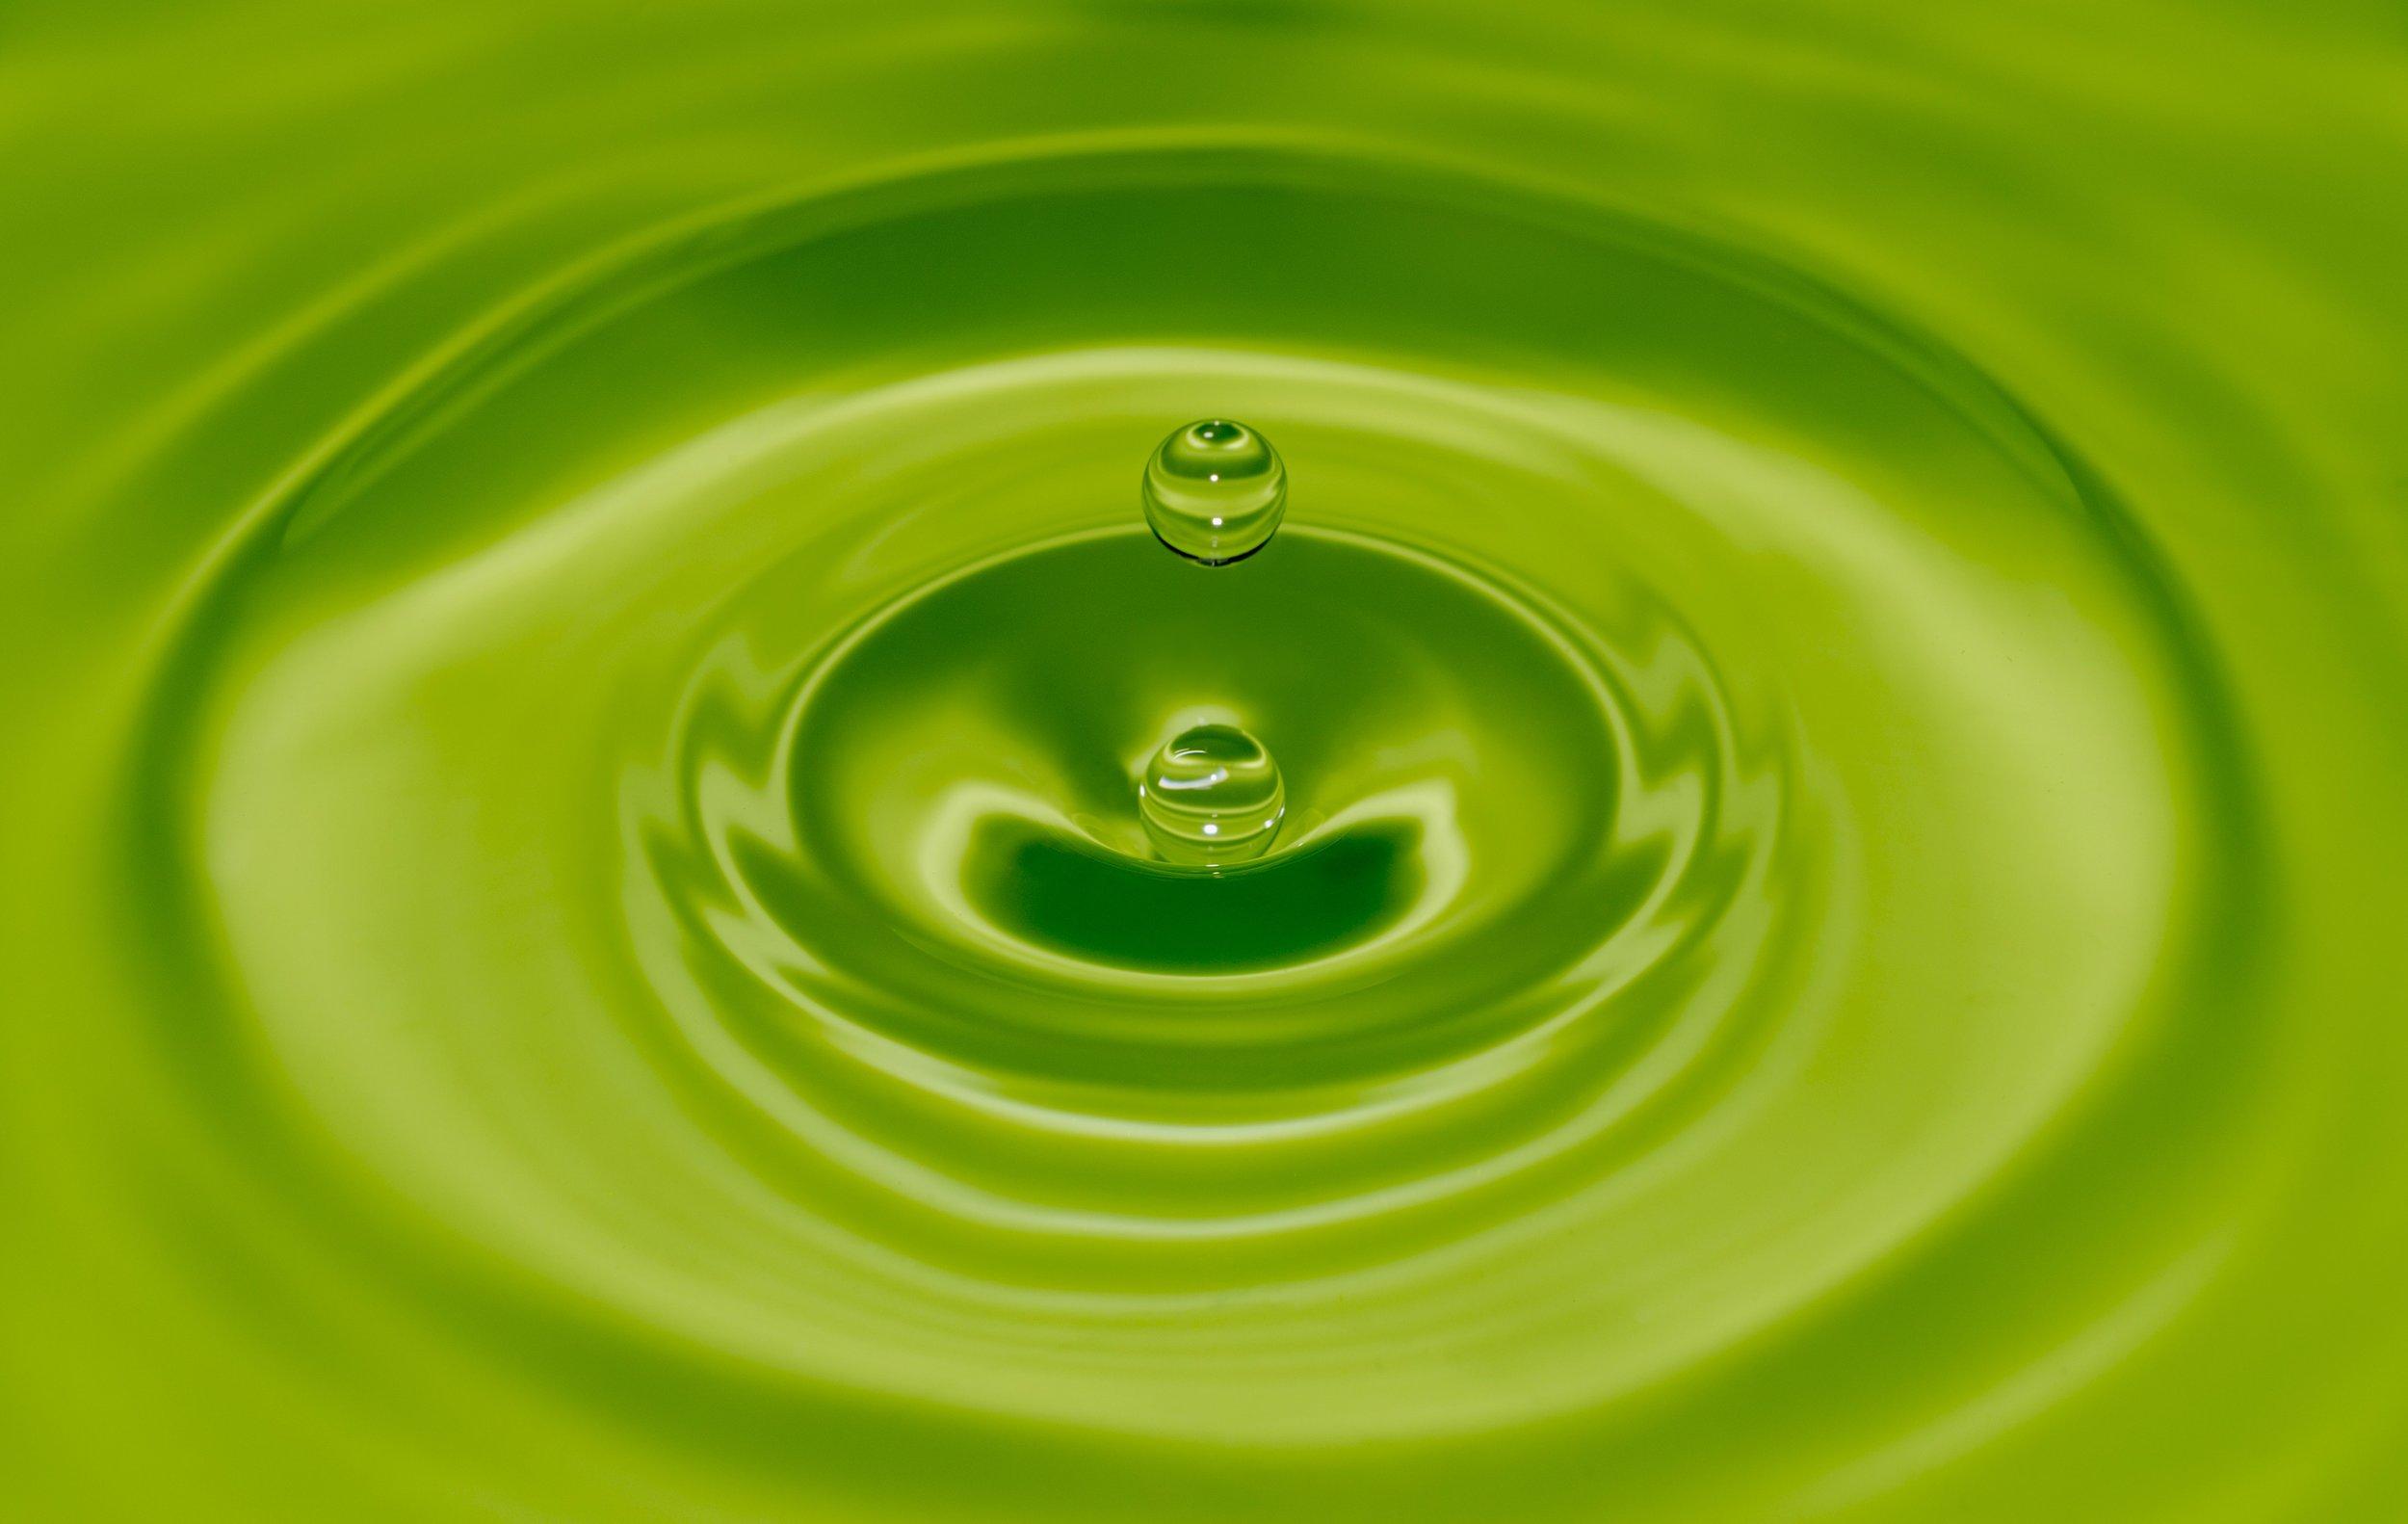 drop-of-water-green-hd-wallpaper-48600.jpg